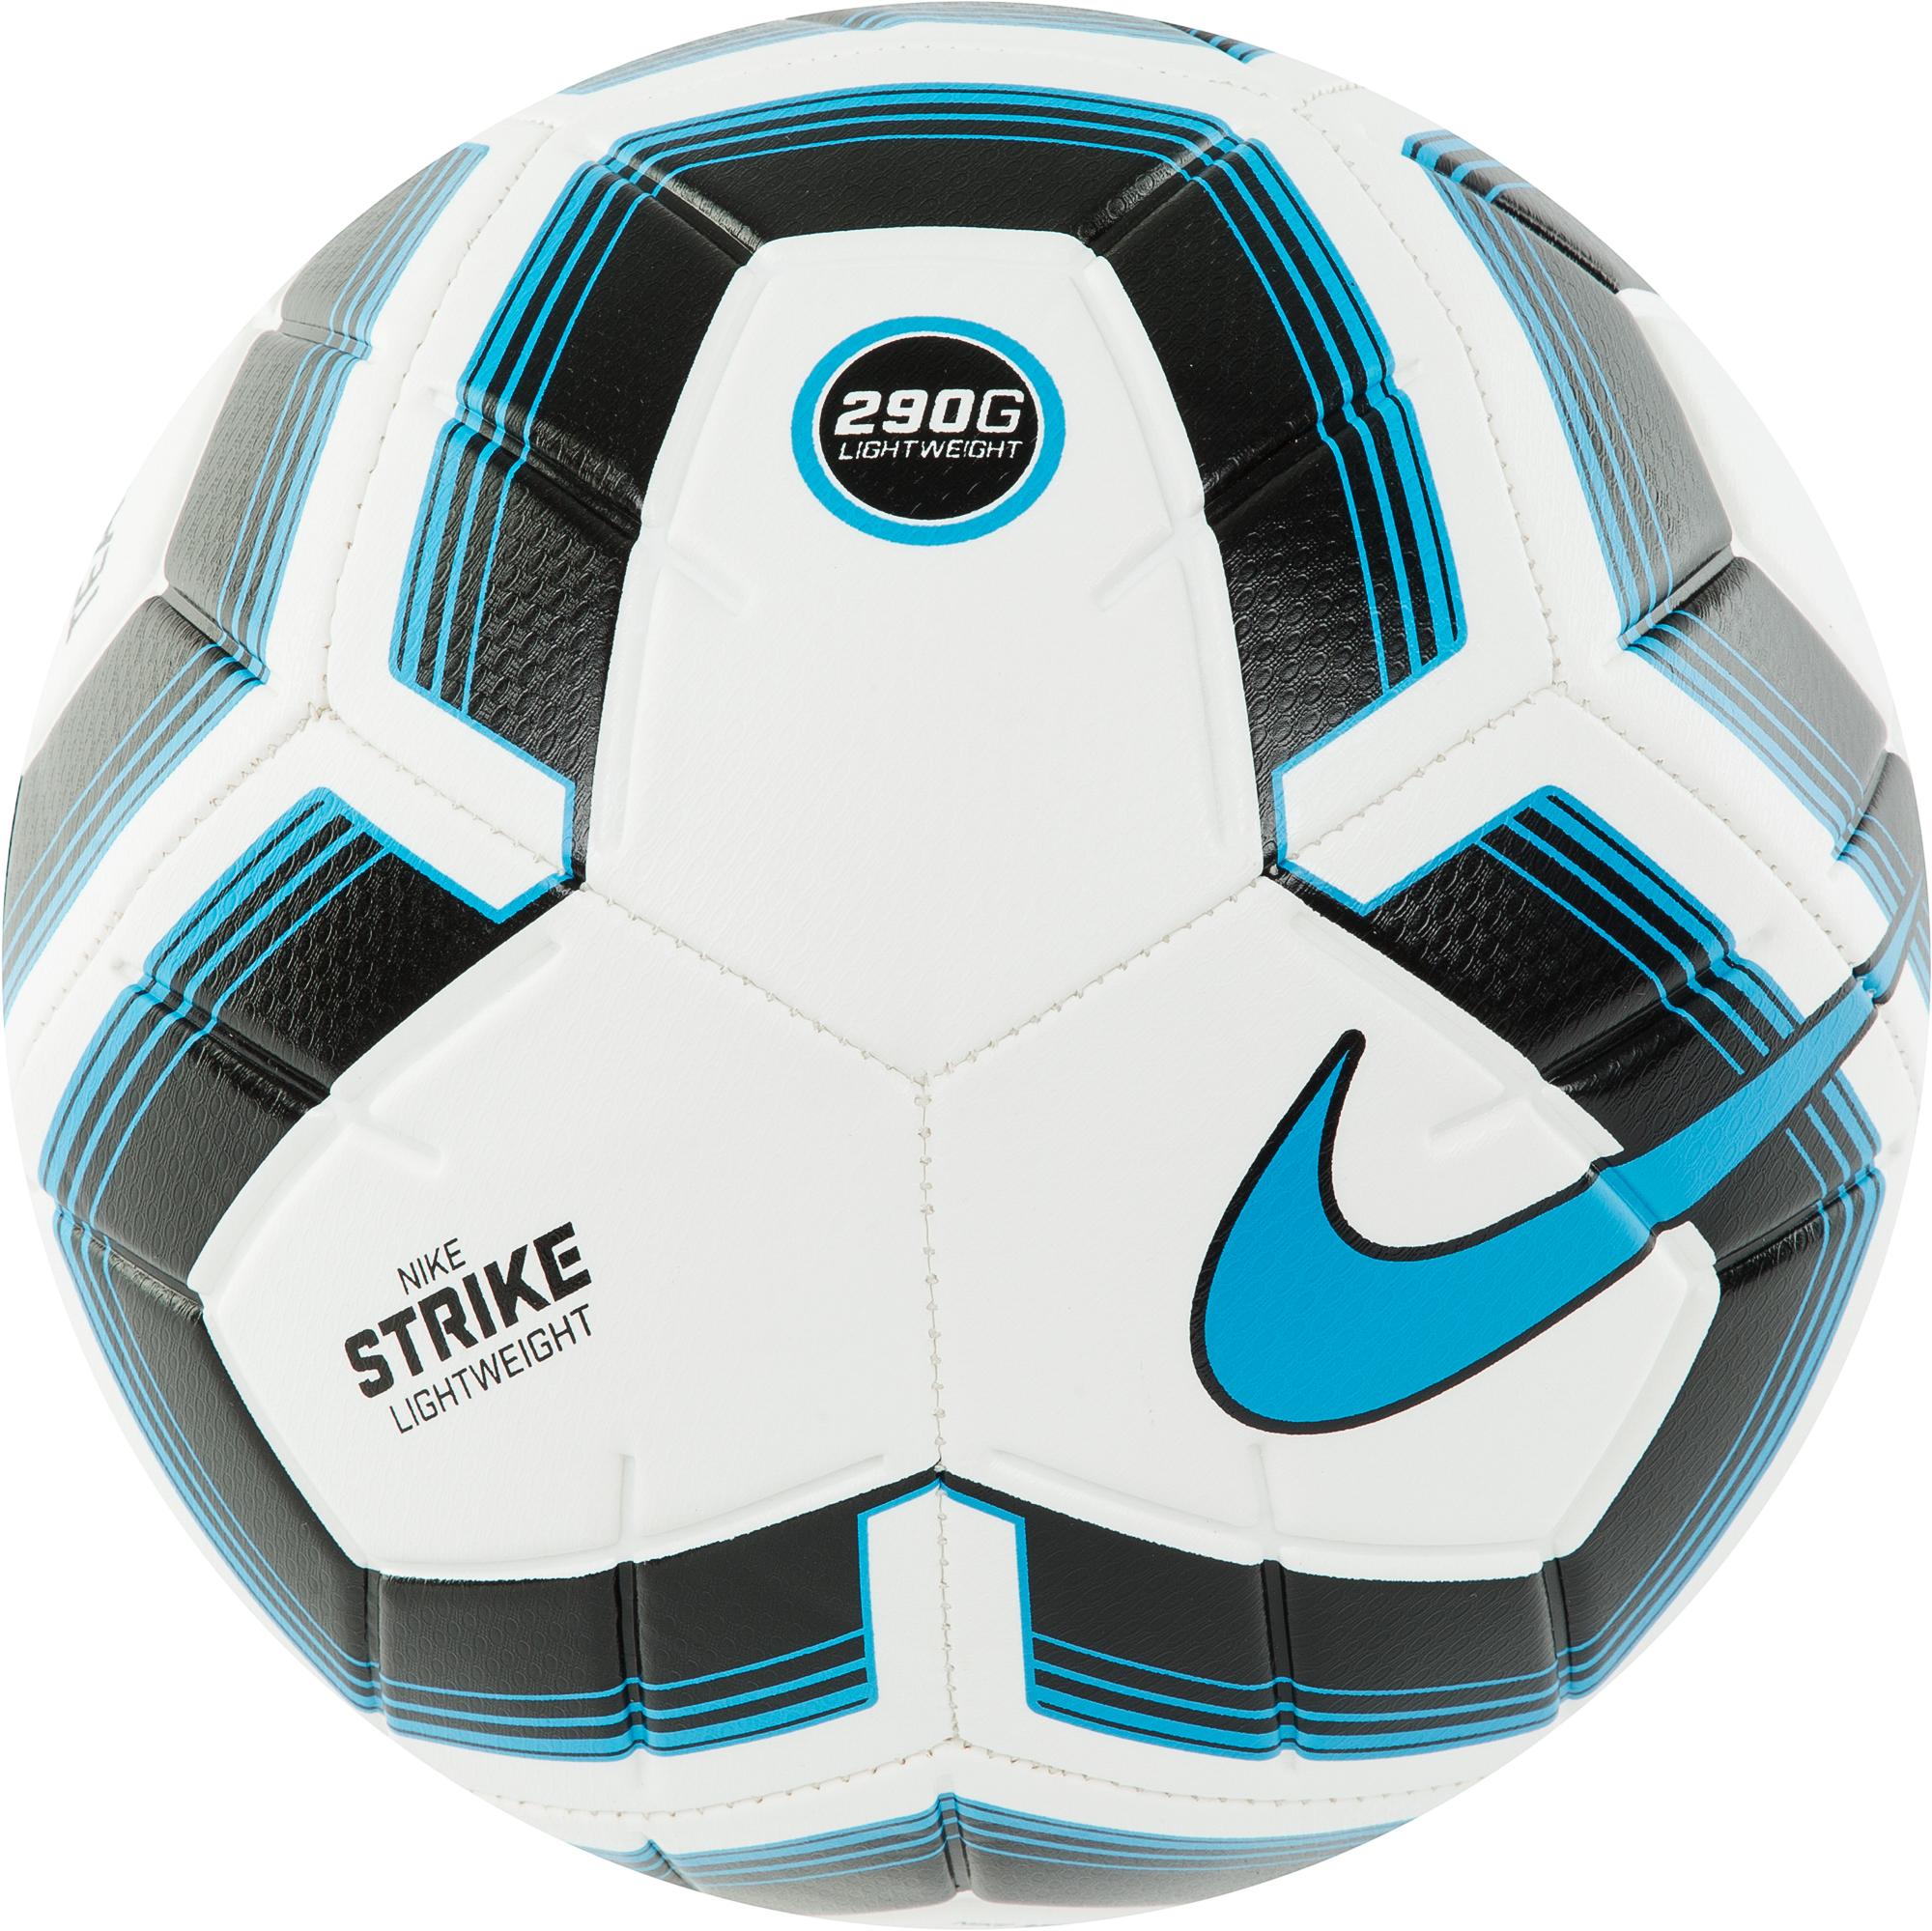 Nike NK STRK TEAM 290G nike мяч nk merc fade